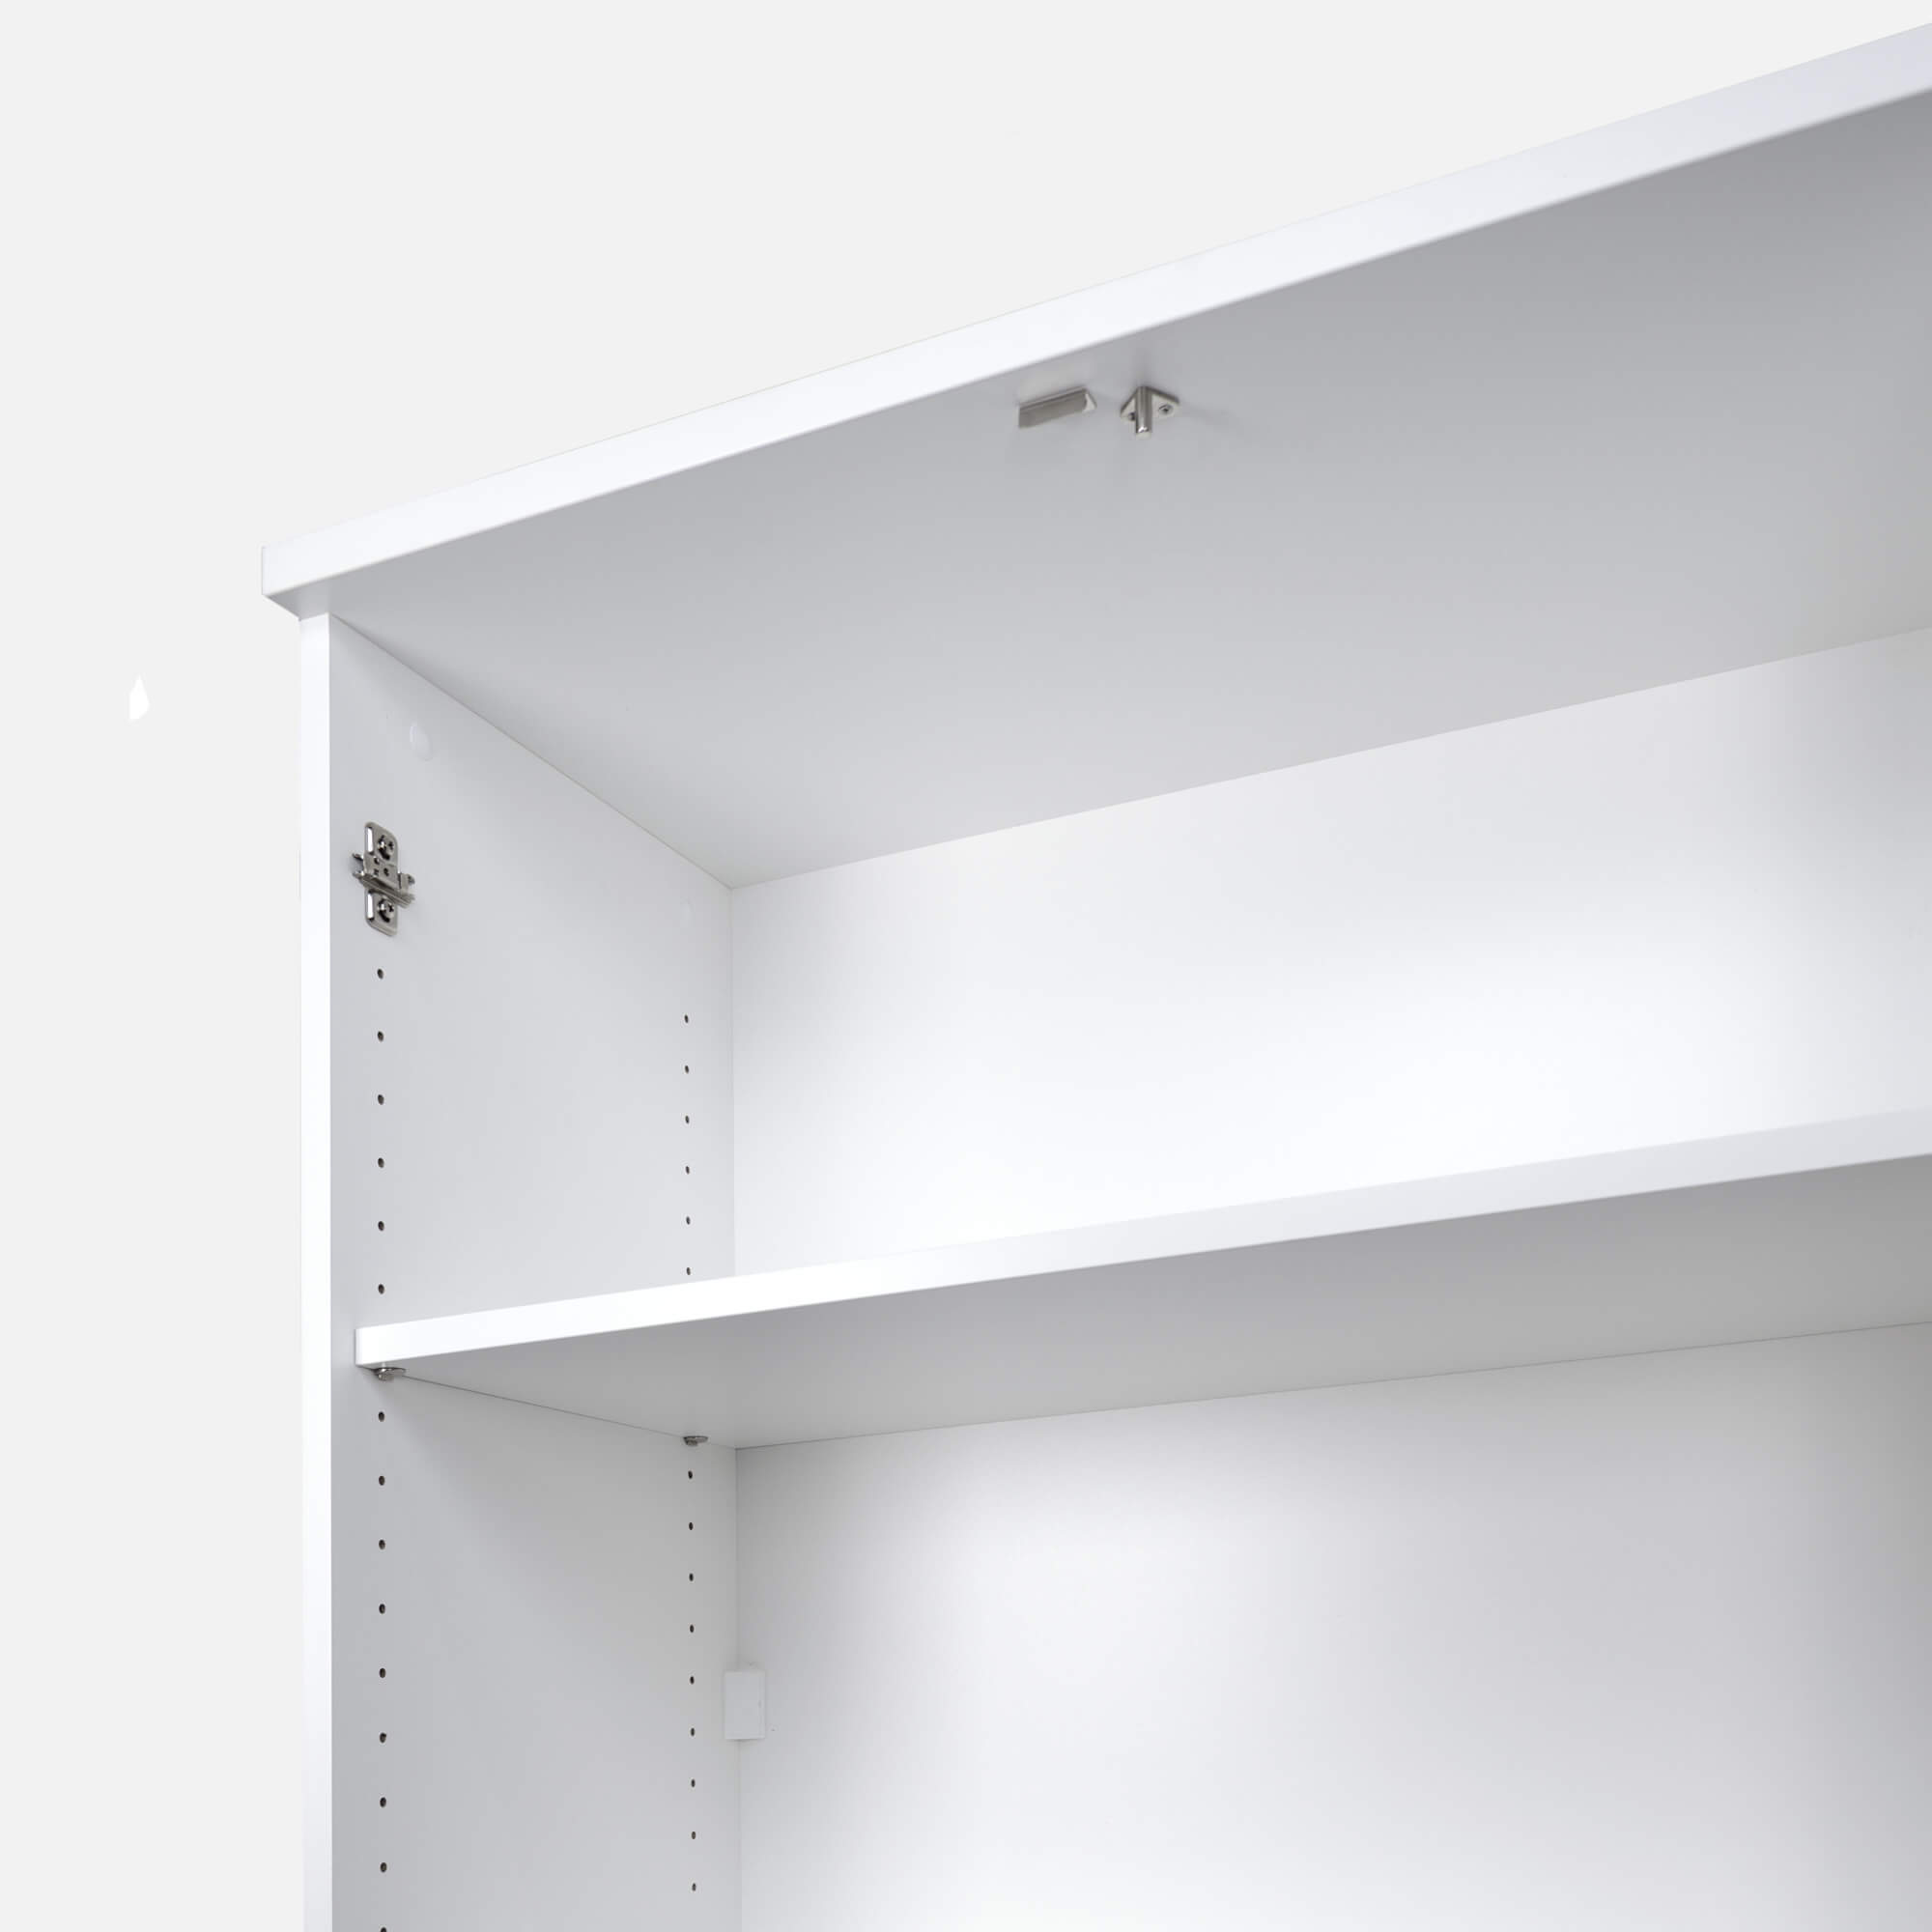 profi aktenschrank abschlie bar 5 oh wei schrank. Black Bedroom Furniture Sets. Home Design Ideas